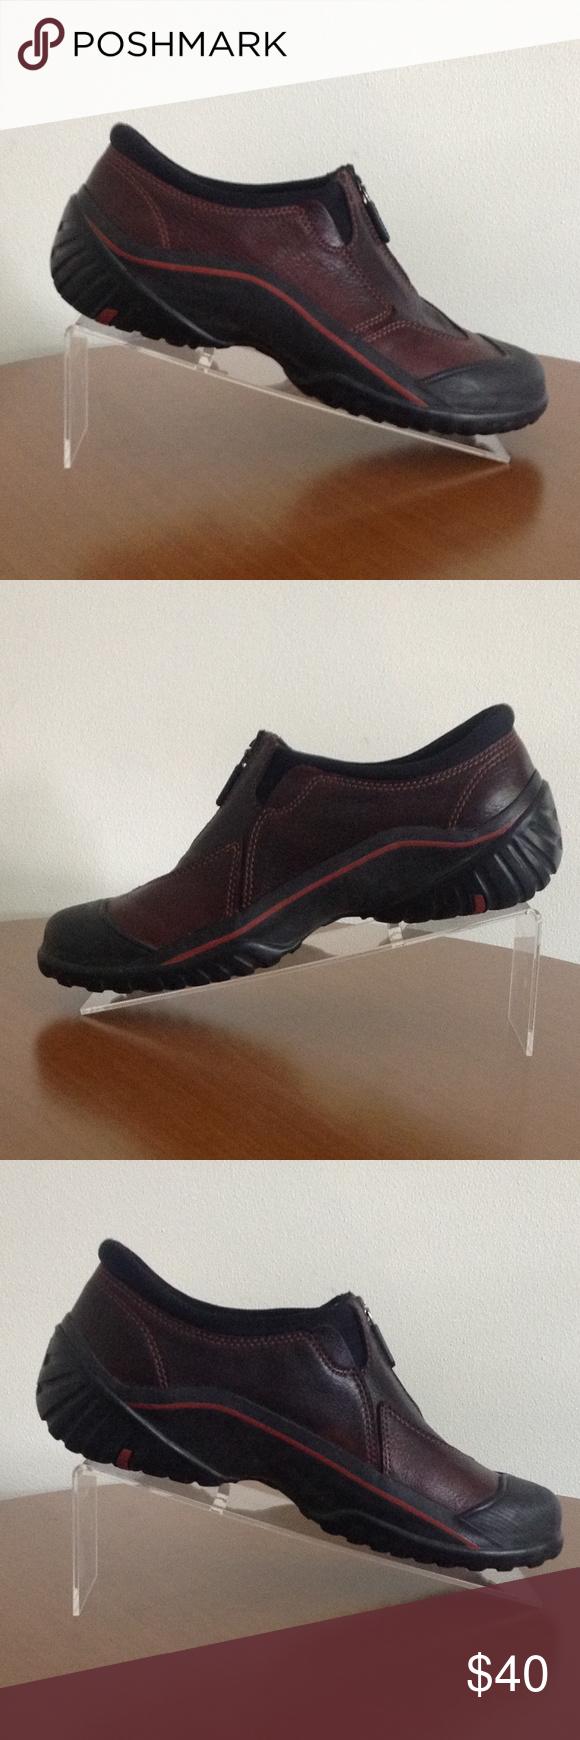 Clarks Muckers Womens Waterproof Shoes